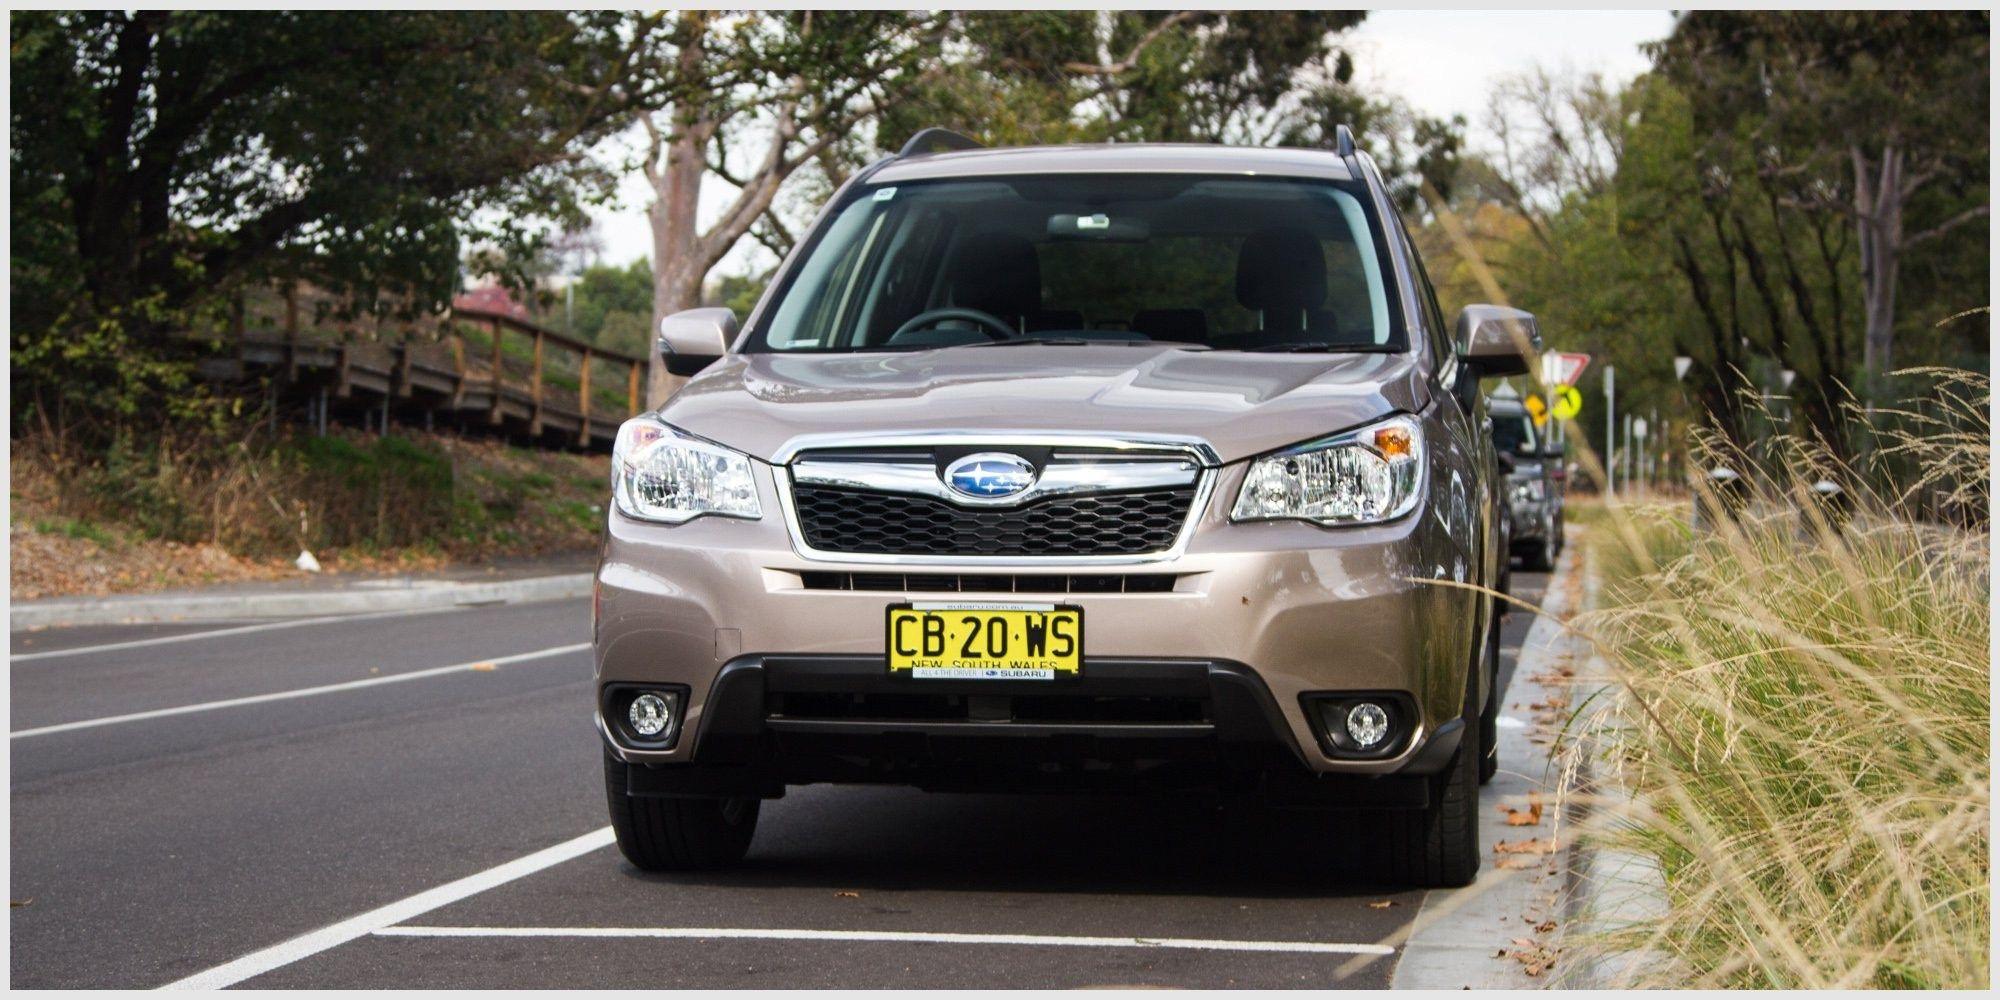 2020 Subaru Outback Turbo Hybrid Subaru Crosstrek Subaru Subaru Forester